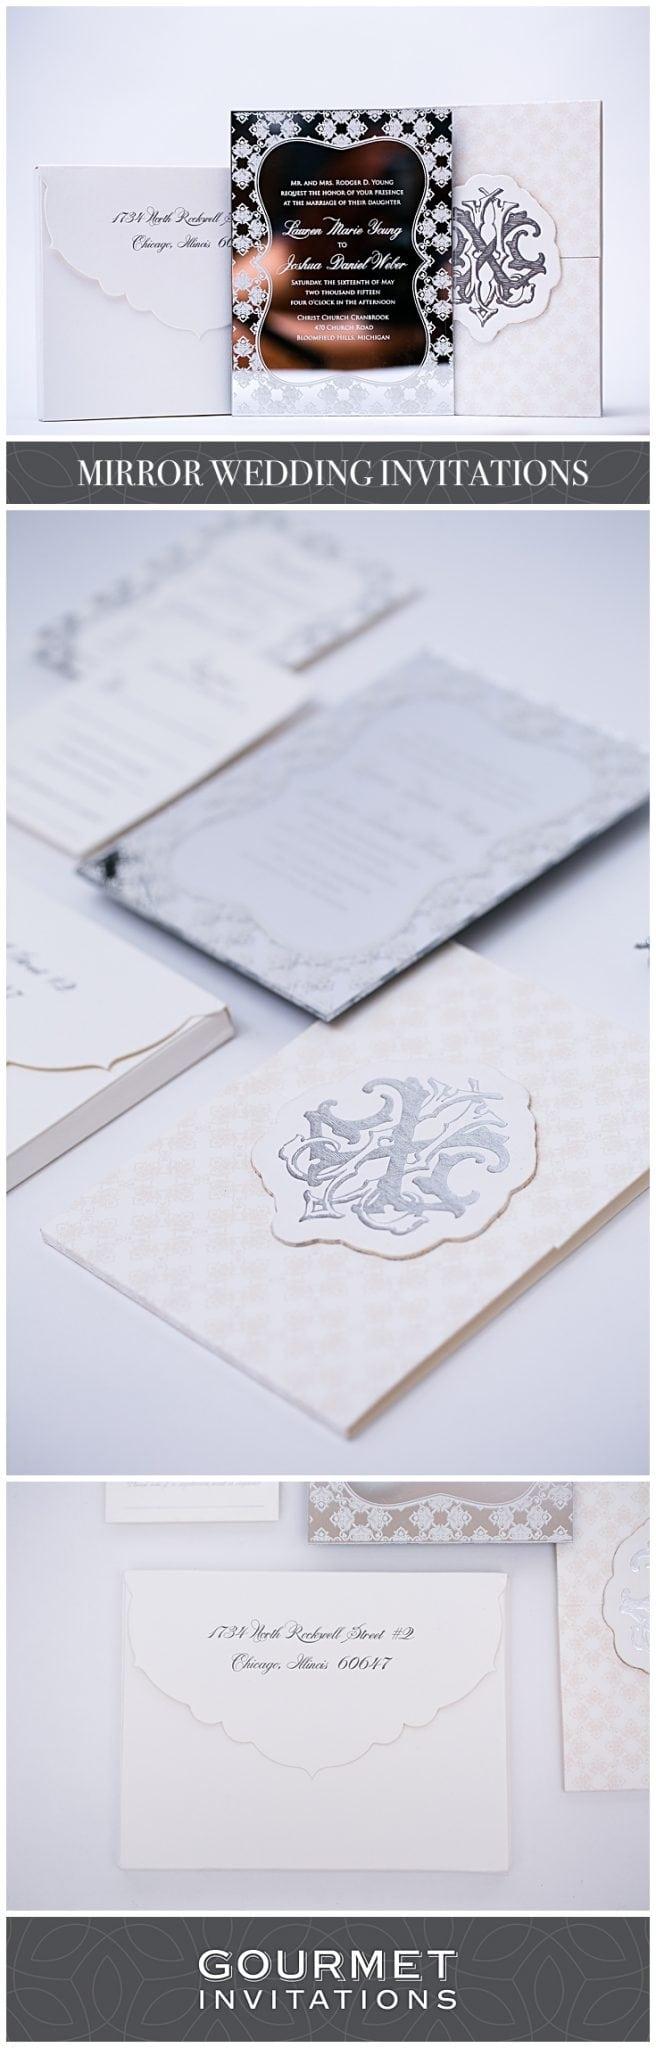 mirror-wedding-invitations_0001